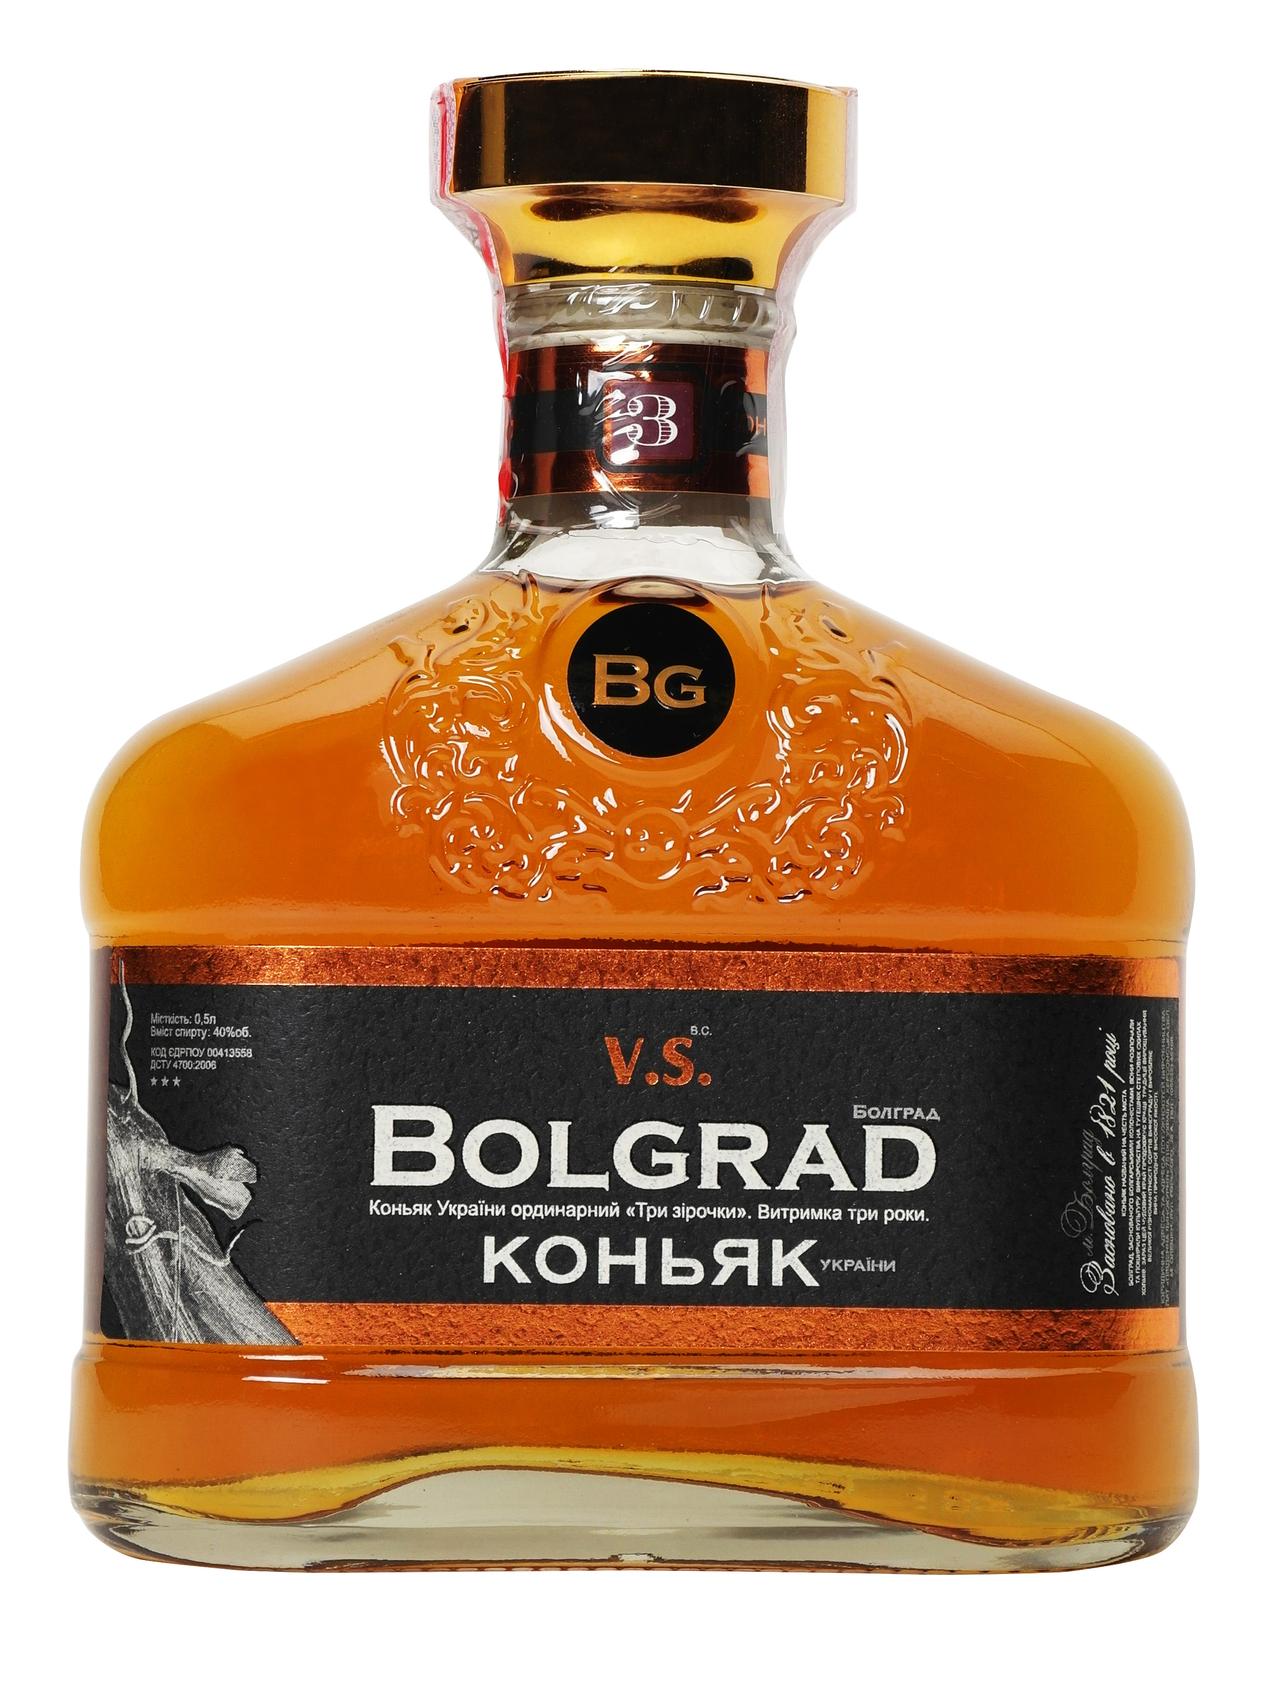 Коньяк Bolgrad VS 3* 40% 0,5л